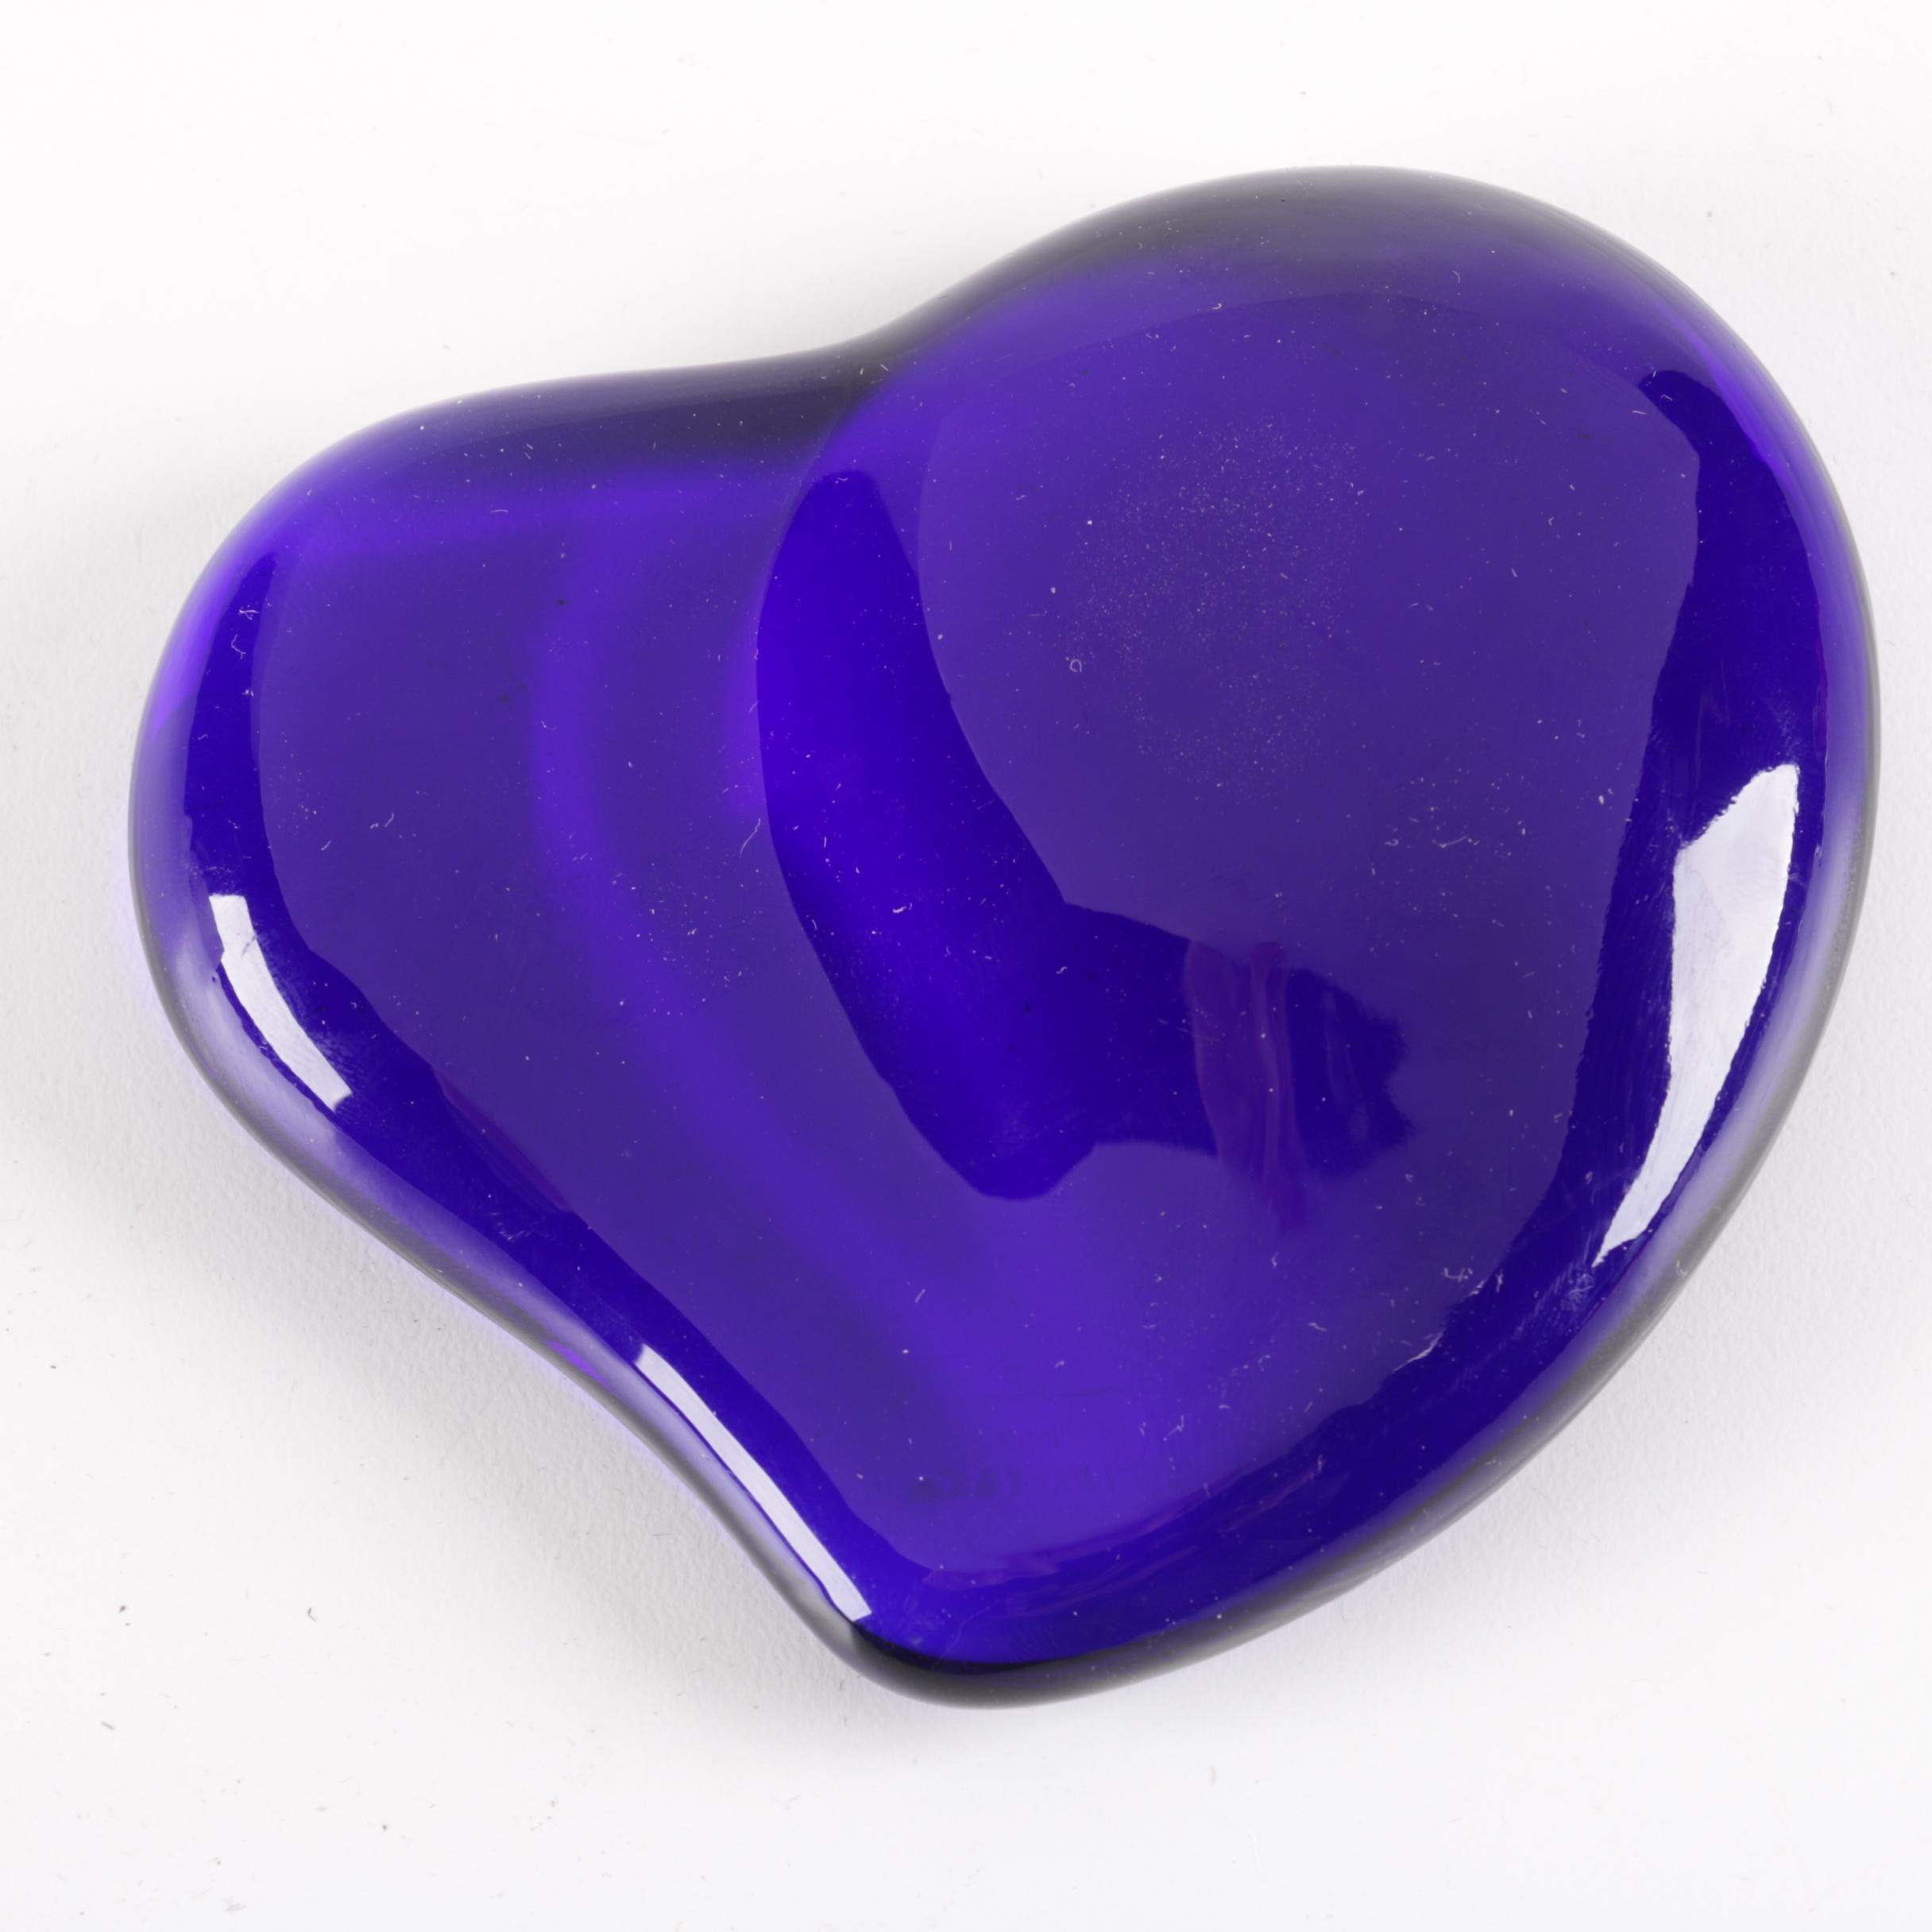 Tiffany & Co. Elsa Peretti Blue Crystal Heart Paperweight